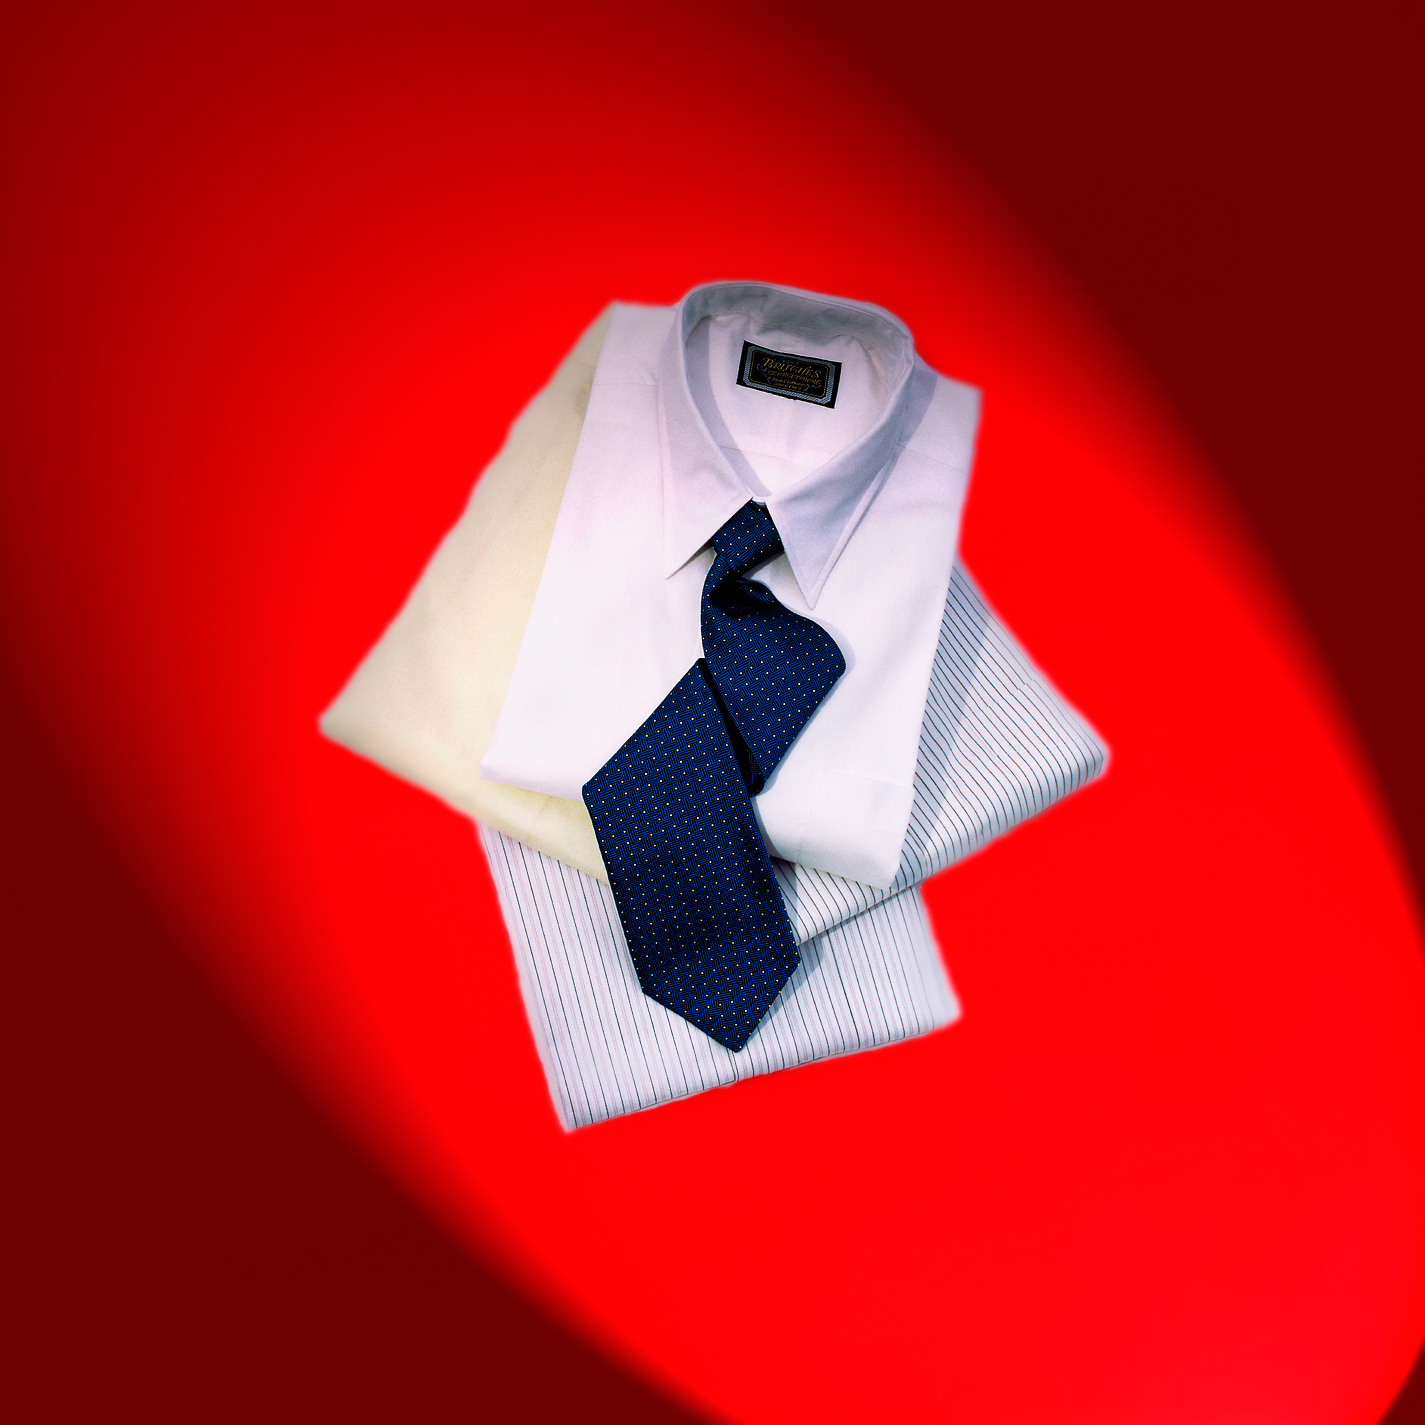 Shirt_Tie.jpg